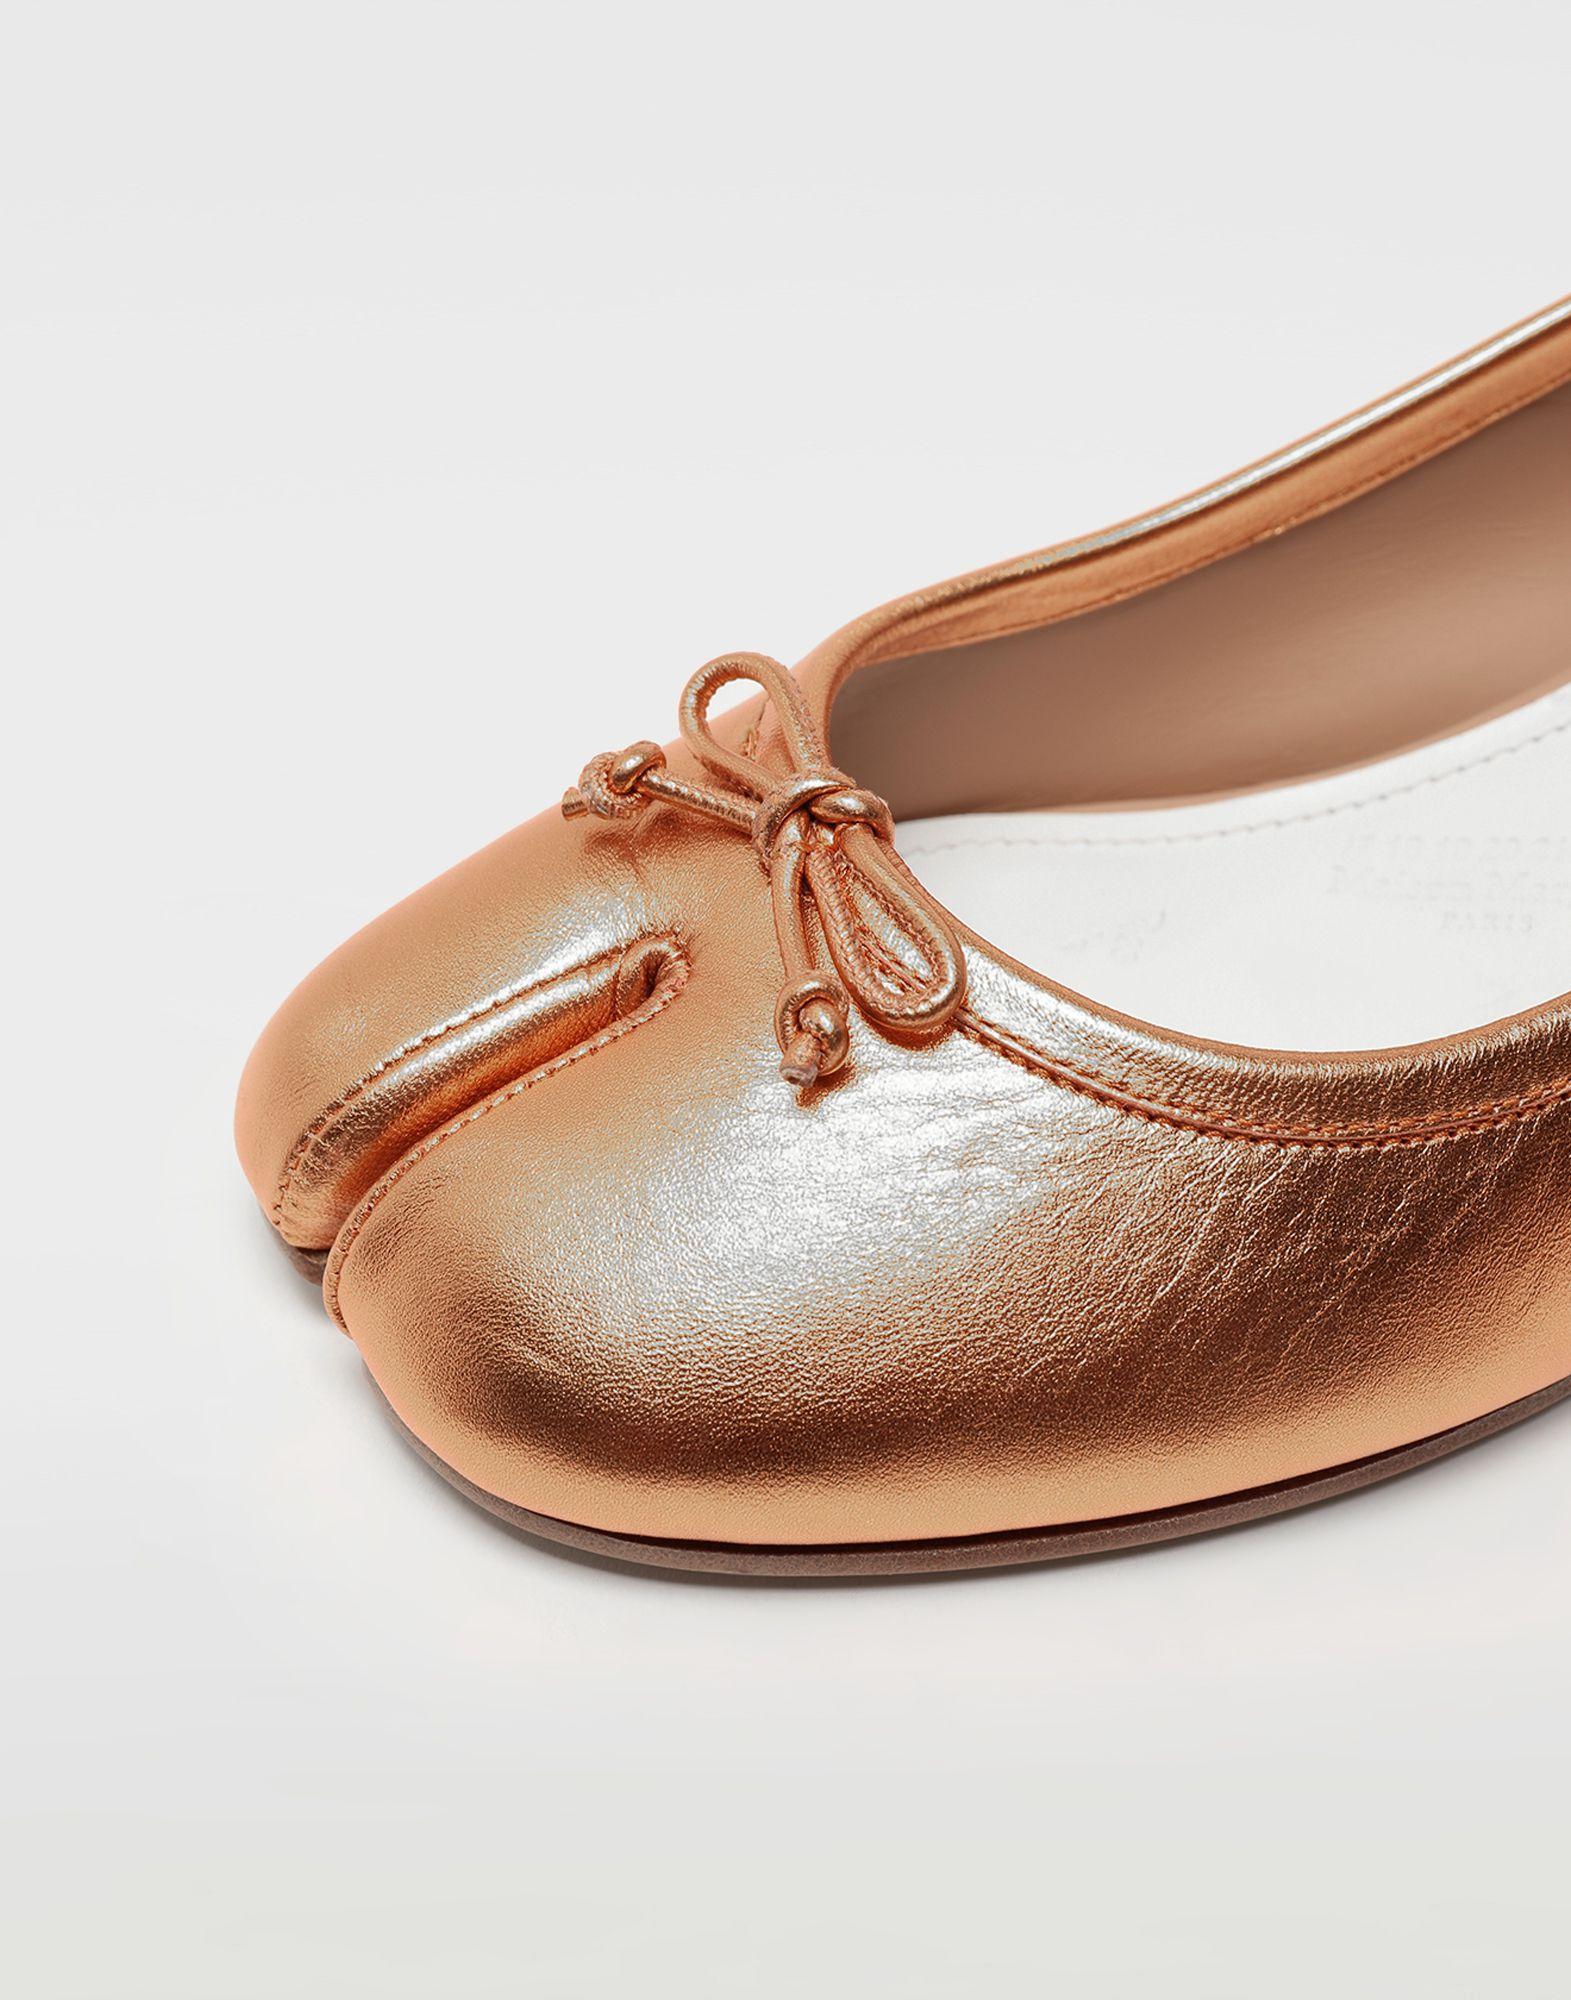 MAISON MARGIELA Tabi laminated leather ballerina pumps Ballet flats Woman a